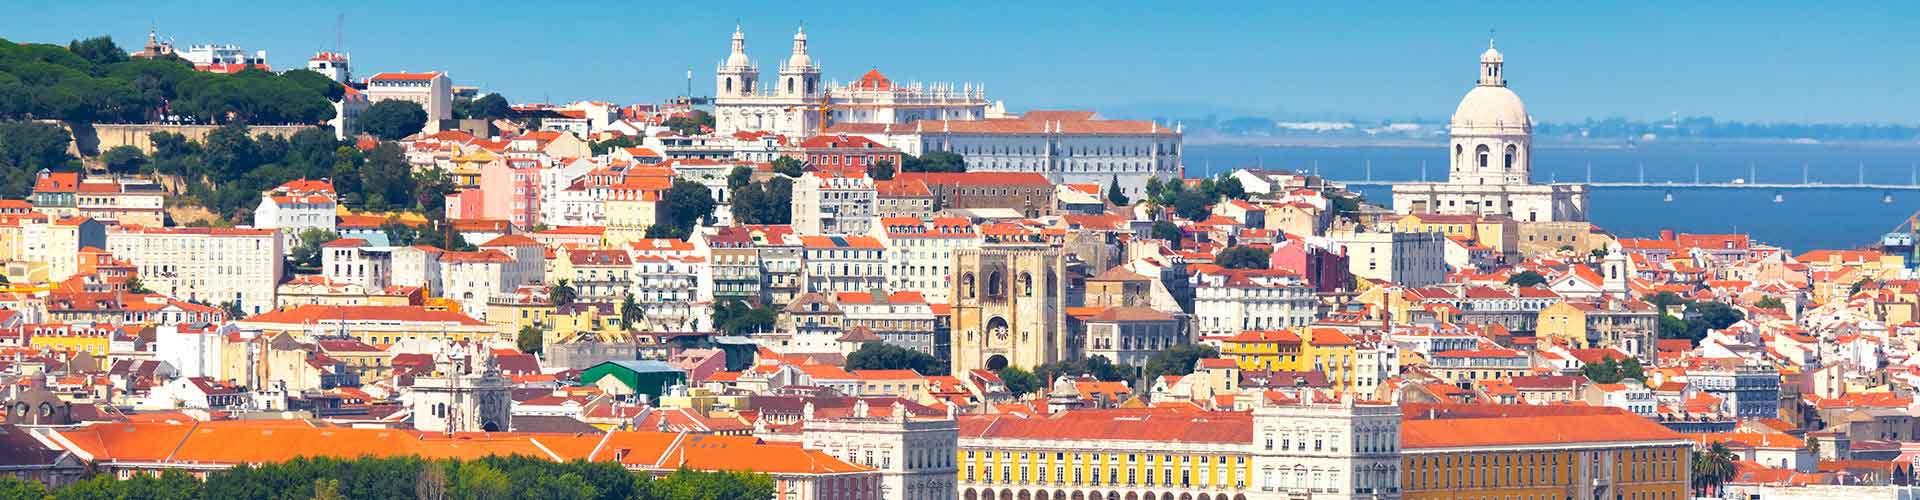 Lisboa - Hoteles baratos en Lisboa. Mapas de Lisboa, Fotos y Comentarios para cada alojamiento en Lisboa.